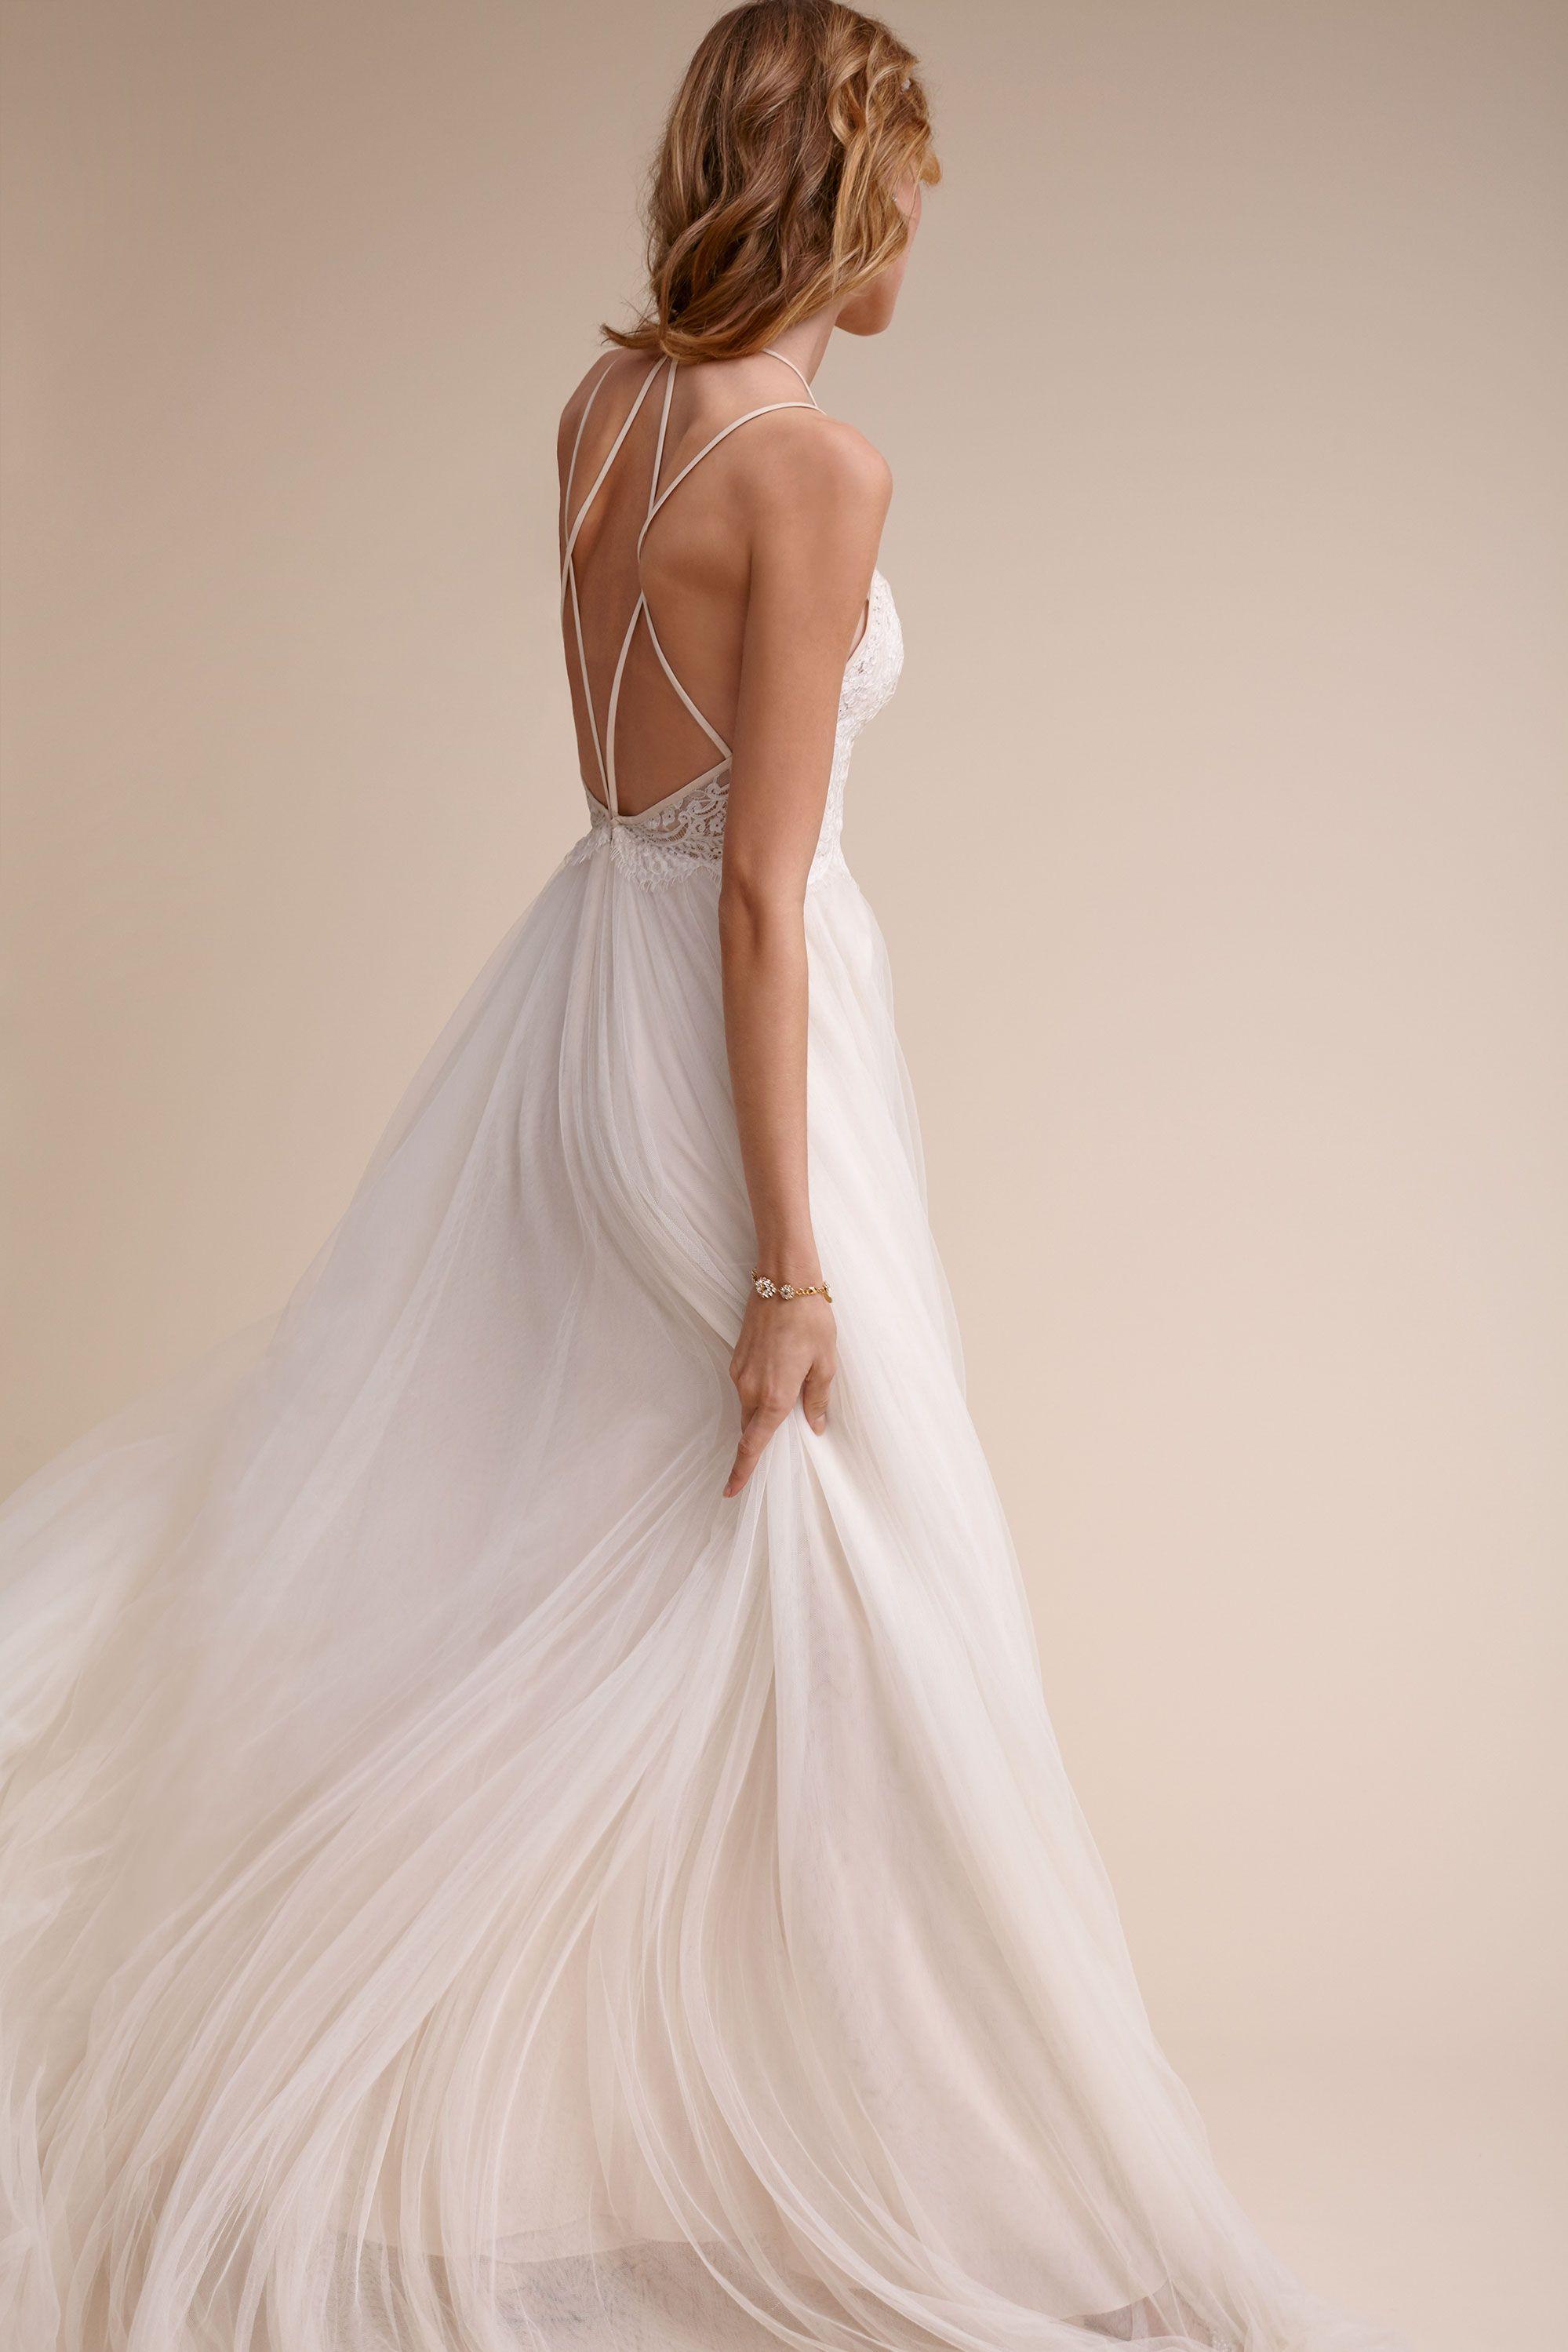 Long back wedding dresses